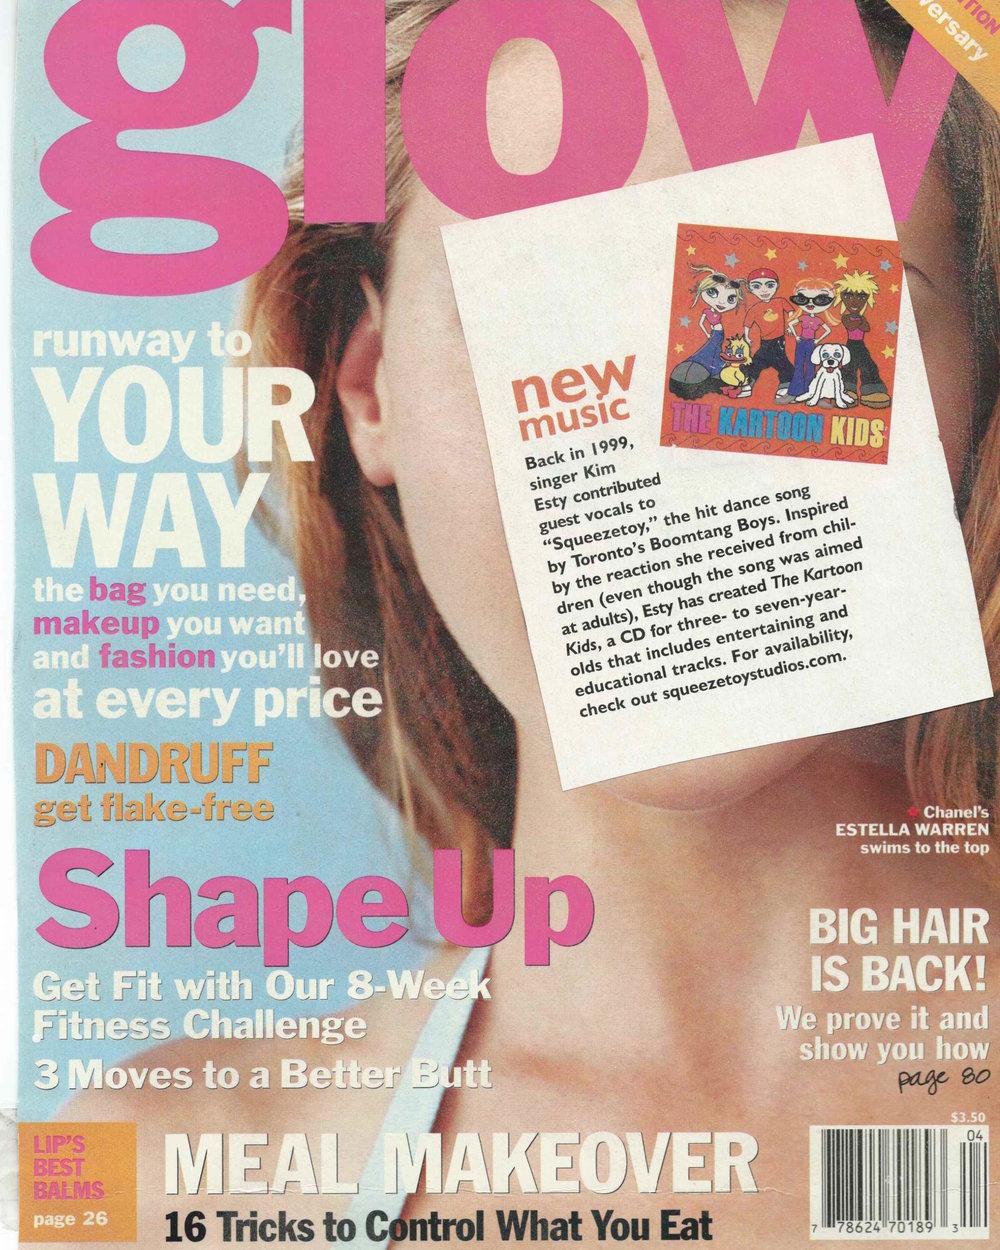 Kim Esty's Kartoon Kids featured in GLOW Magazine